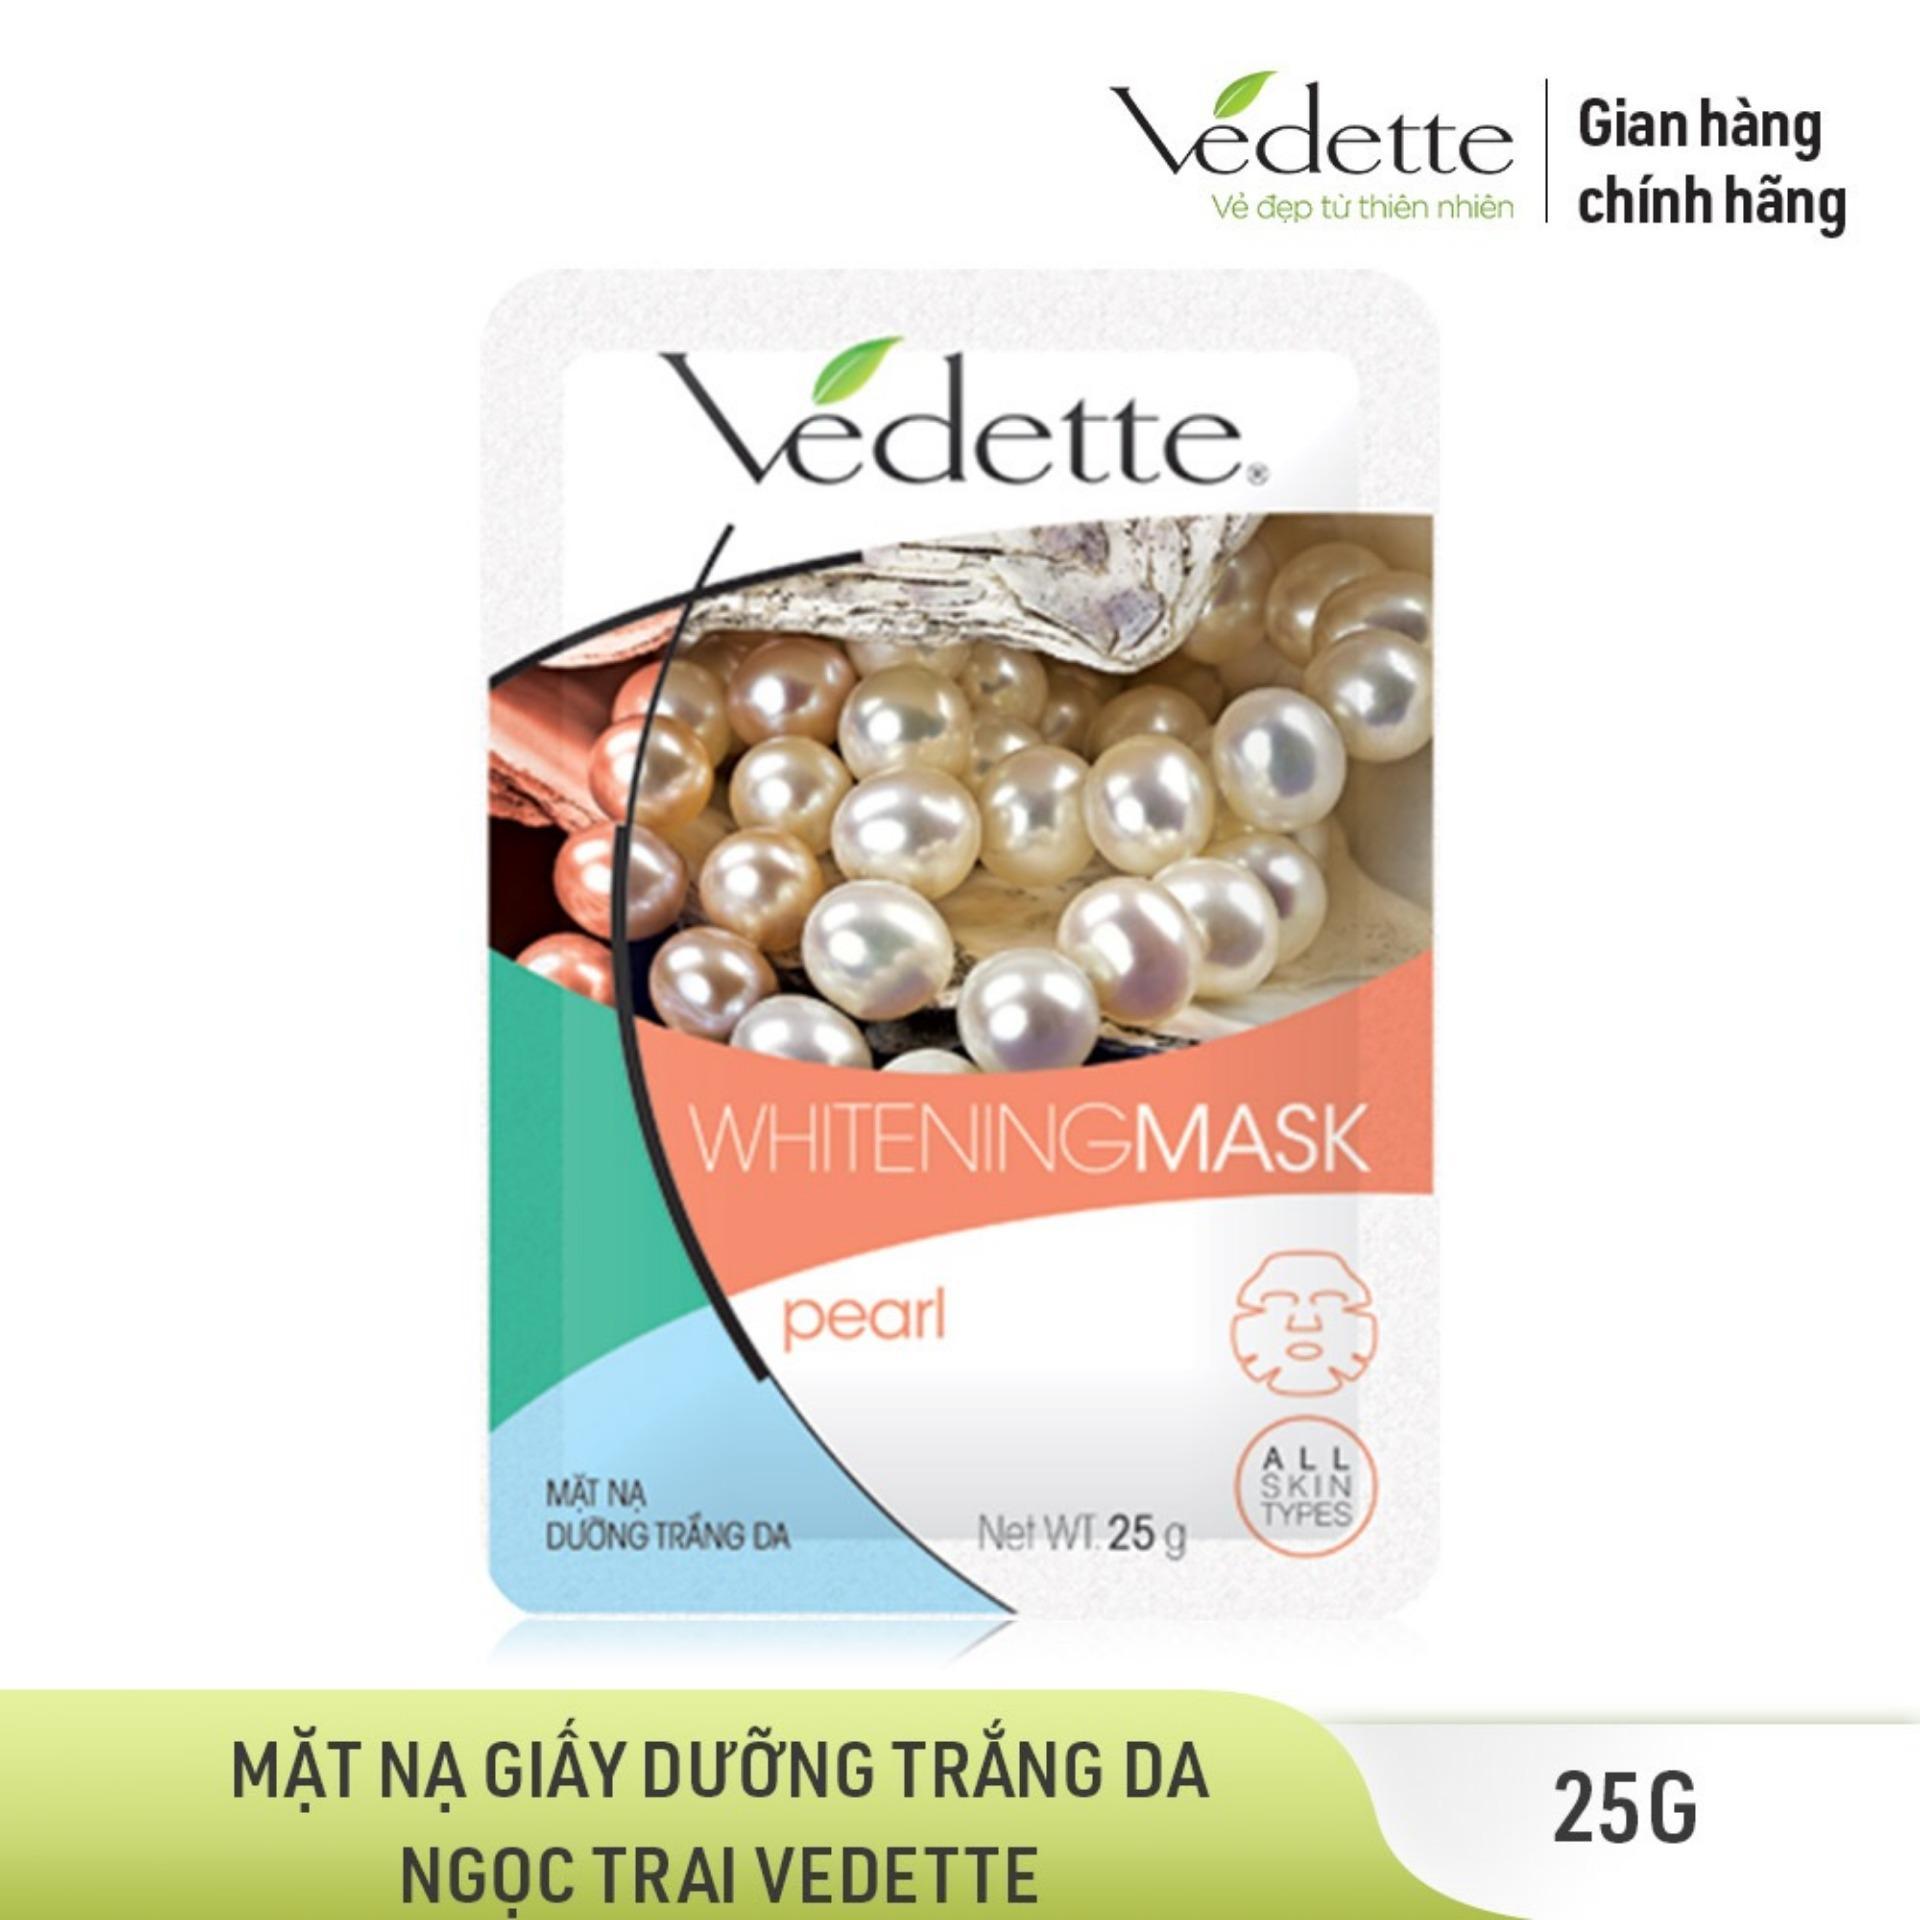 Mặt nạ giấy dưỡng trắng da Ngọc trai Vedette Whitening Mask Pearl 25g